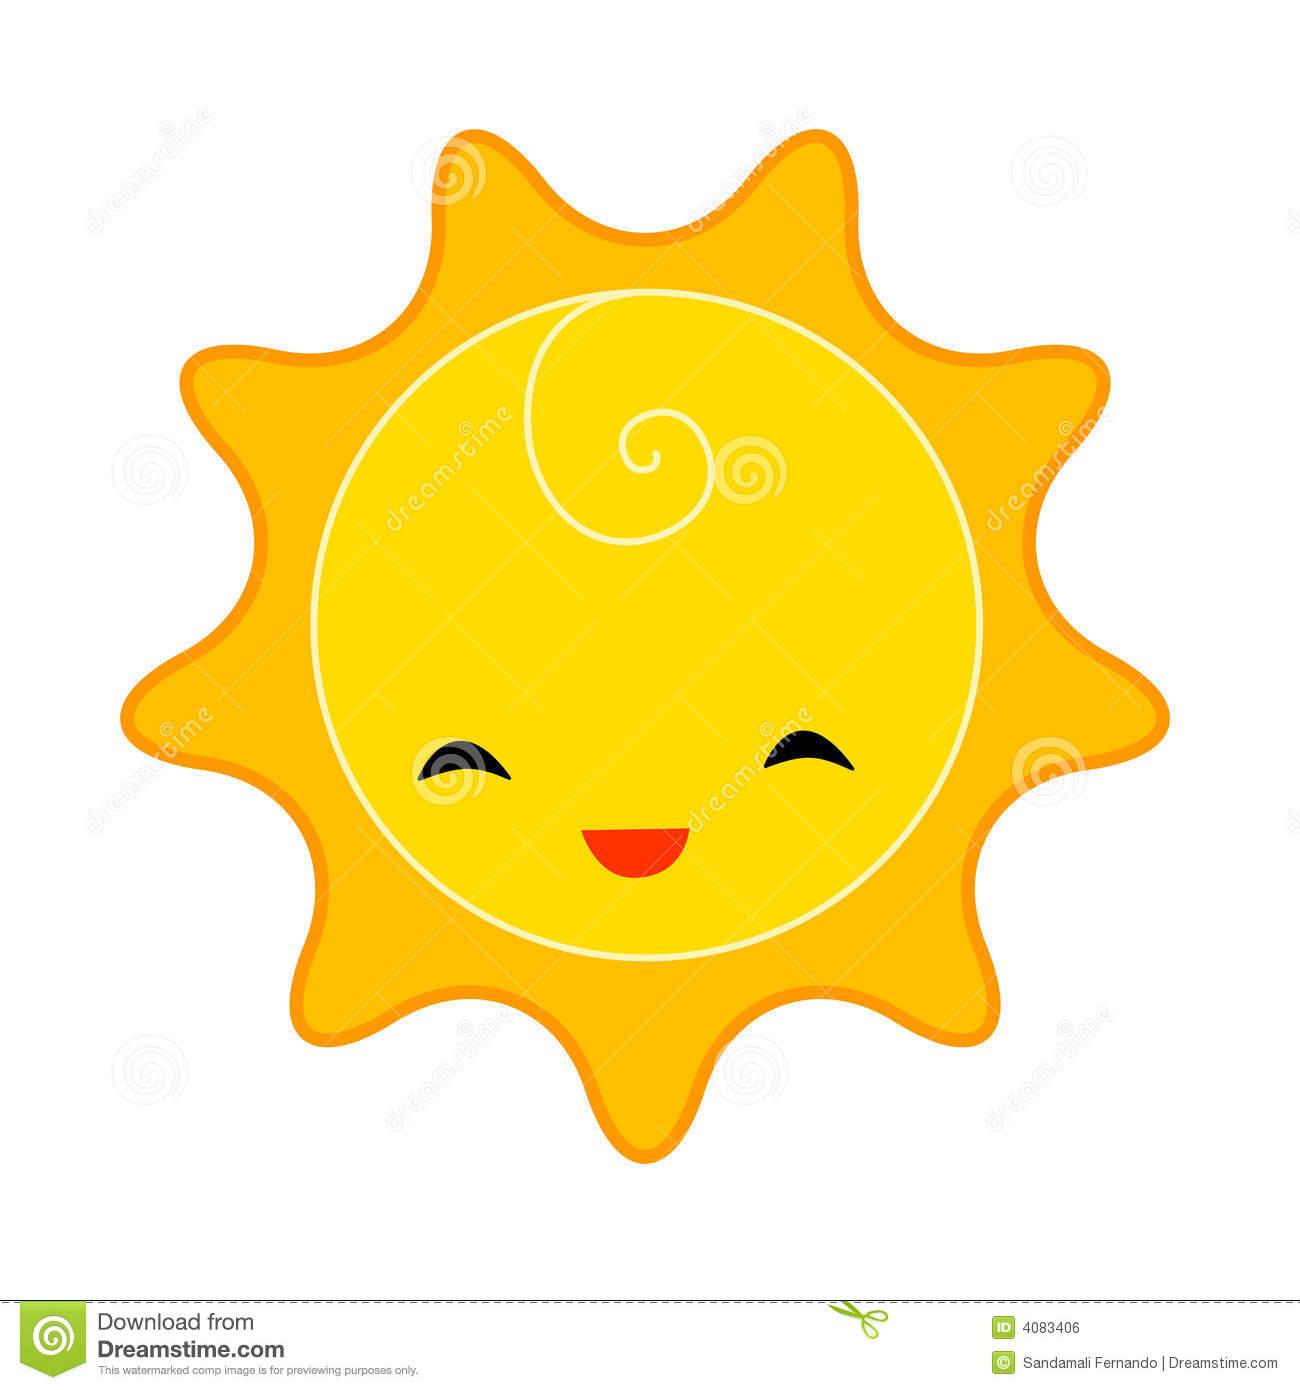 Sun Clipart - Clipart Kid